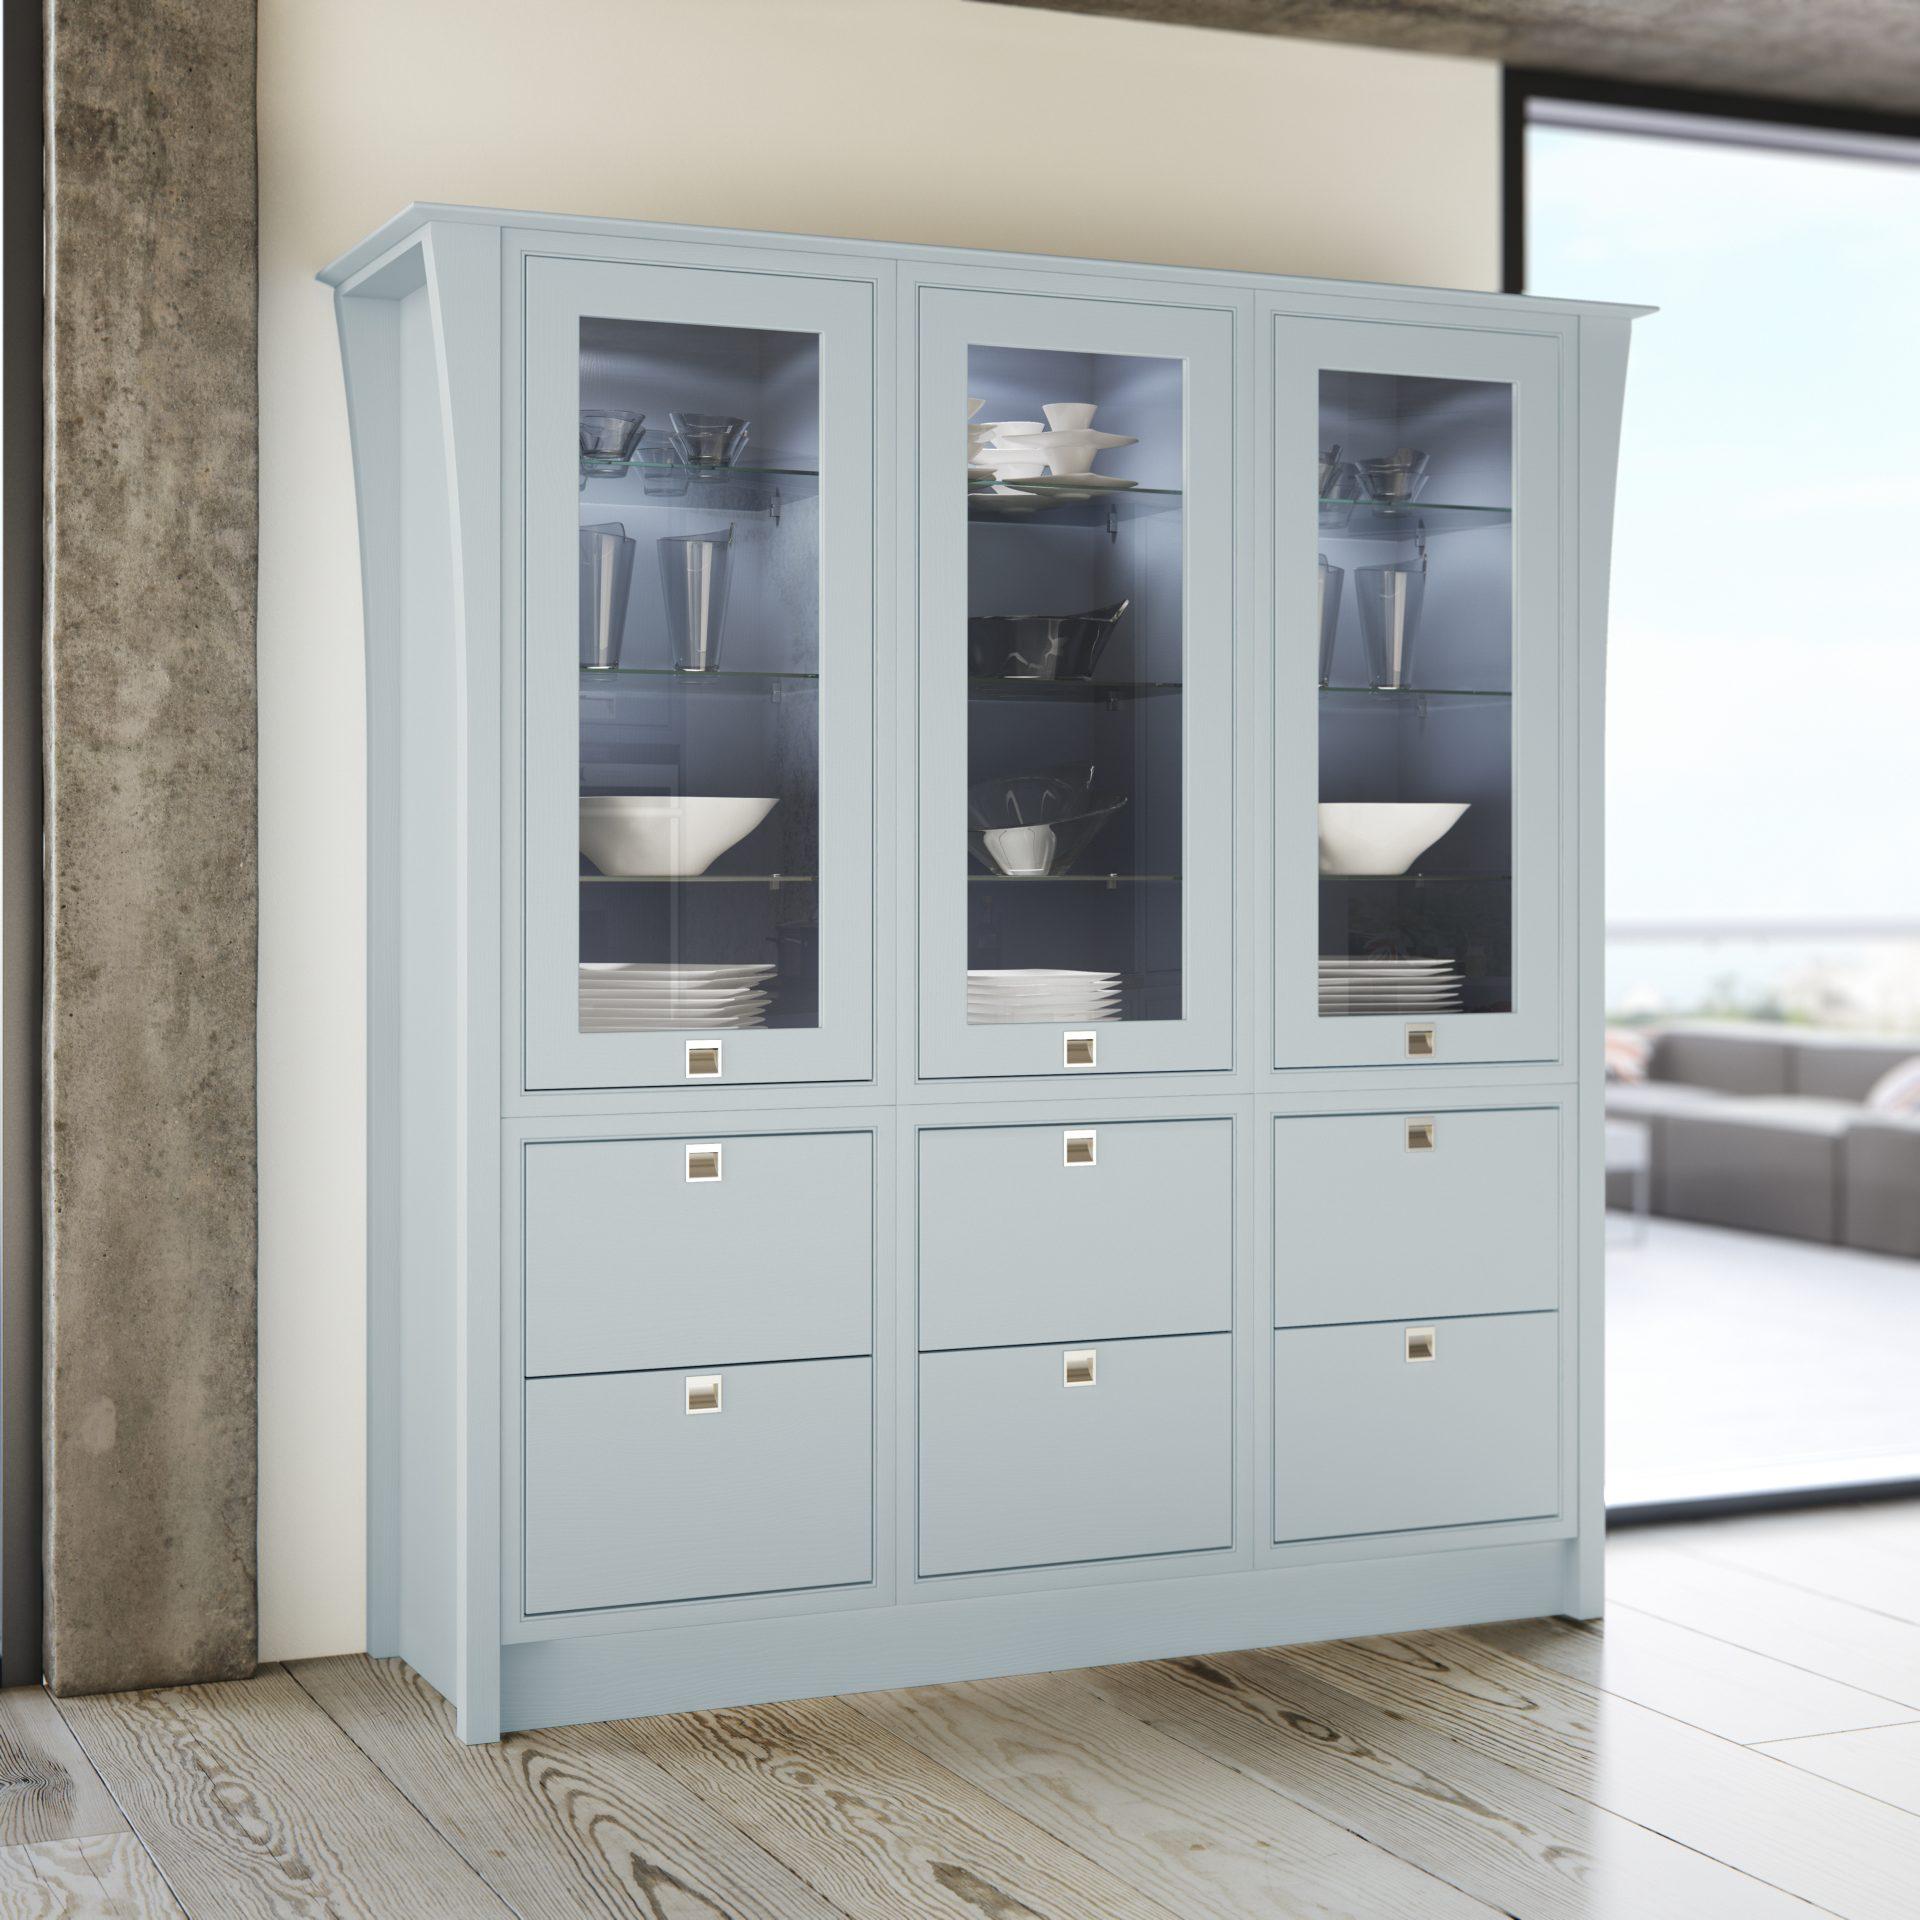 Glazed Larder Cabinet